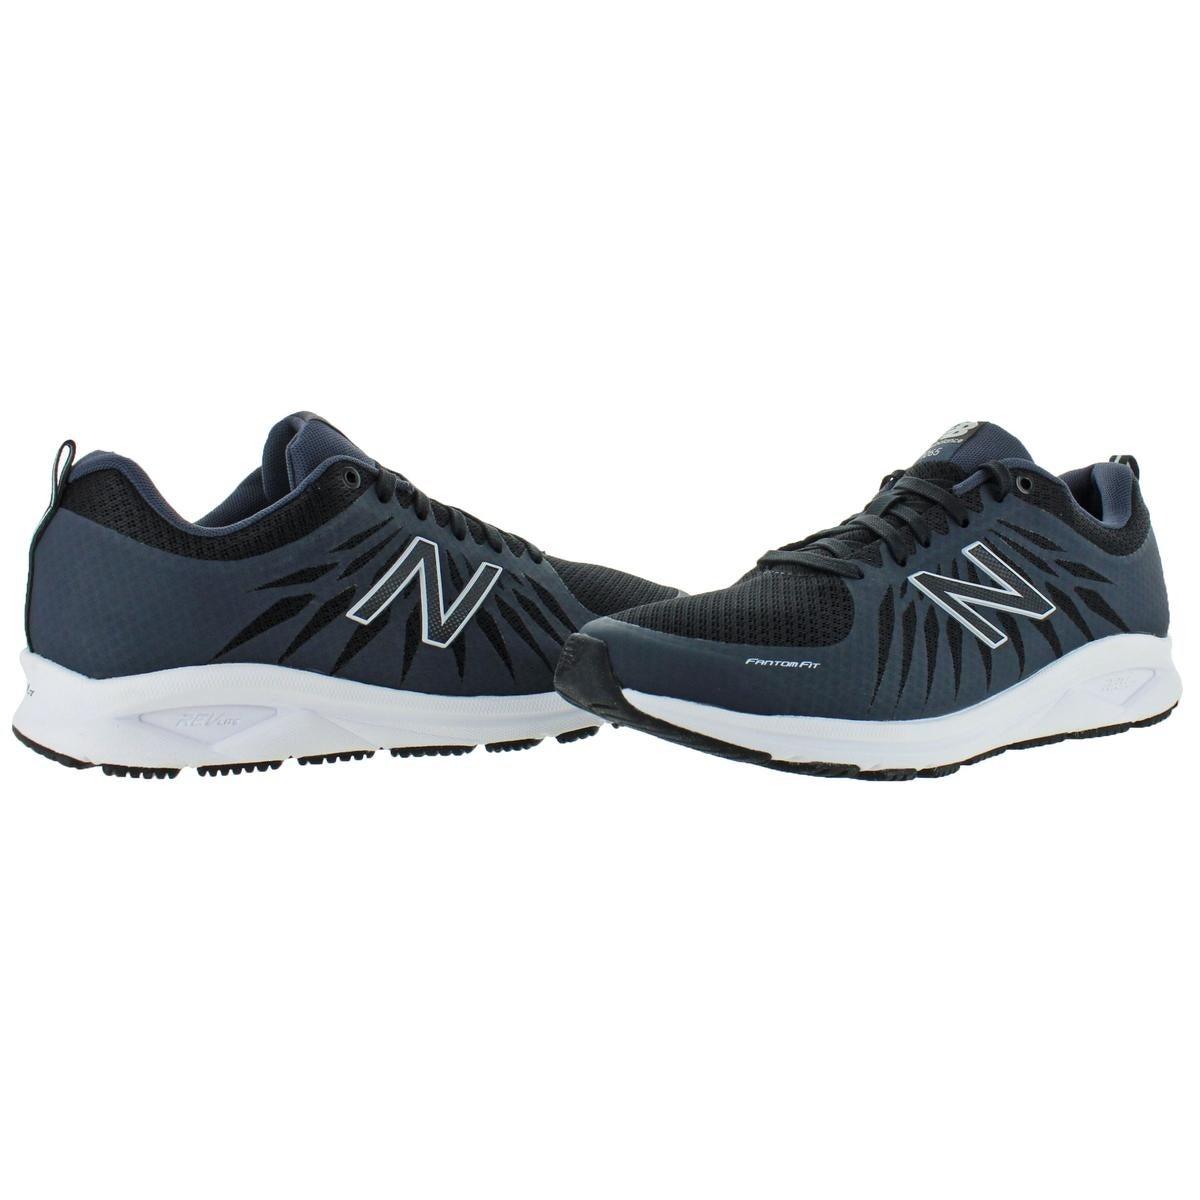 New Balance Womens 1065 Walking Shoes